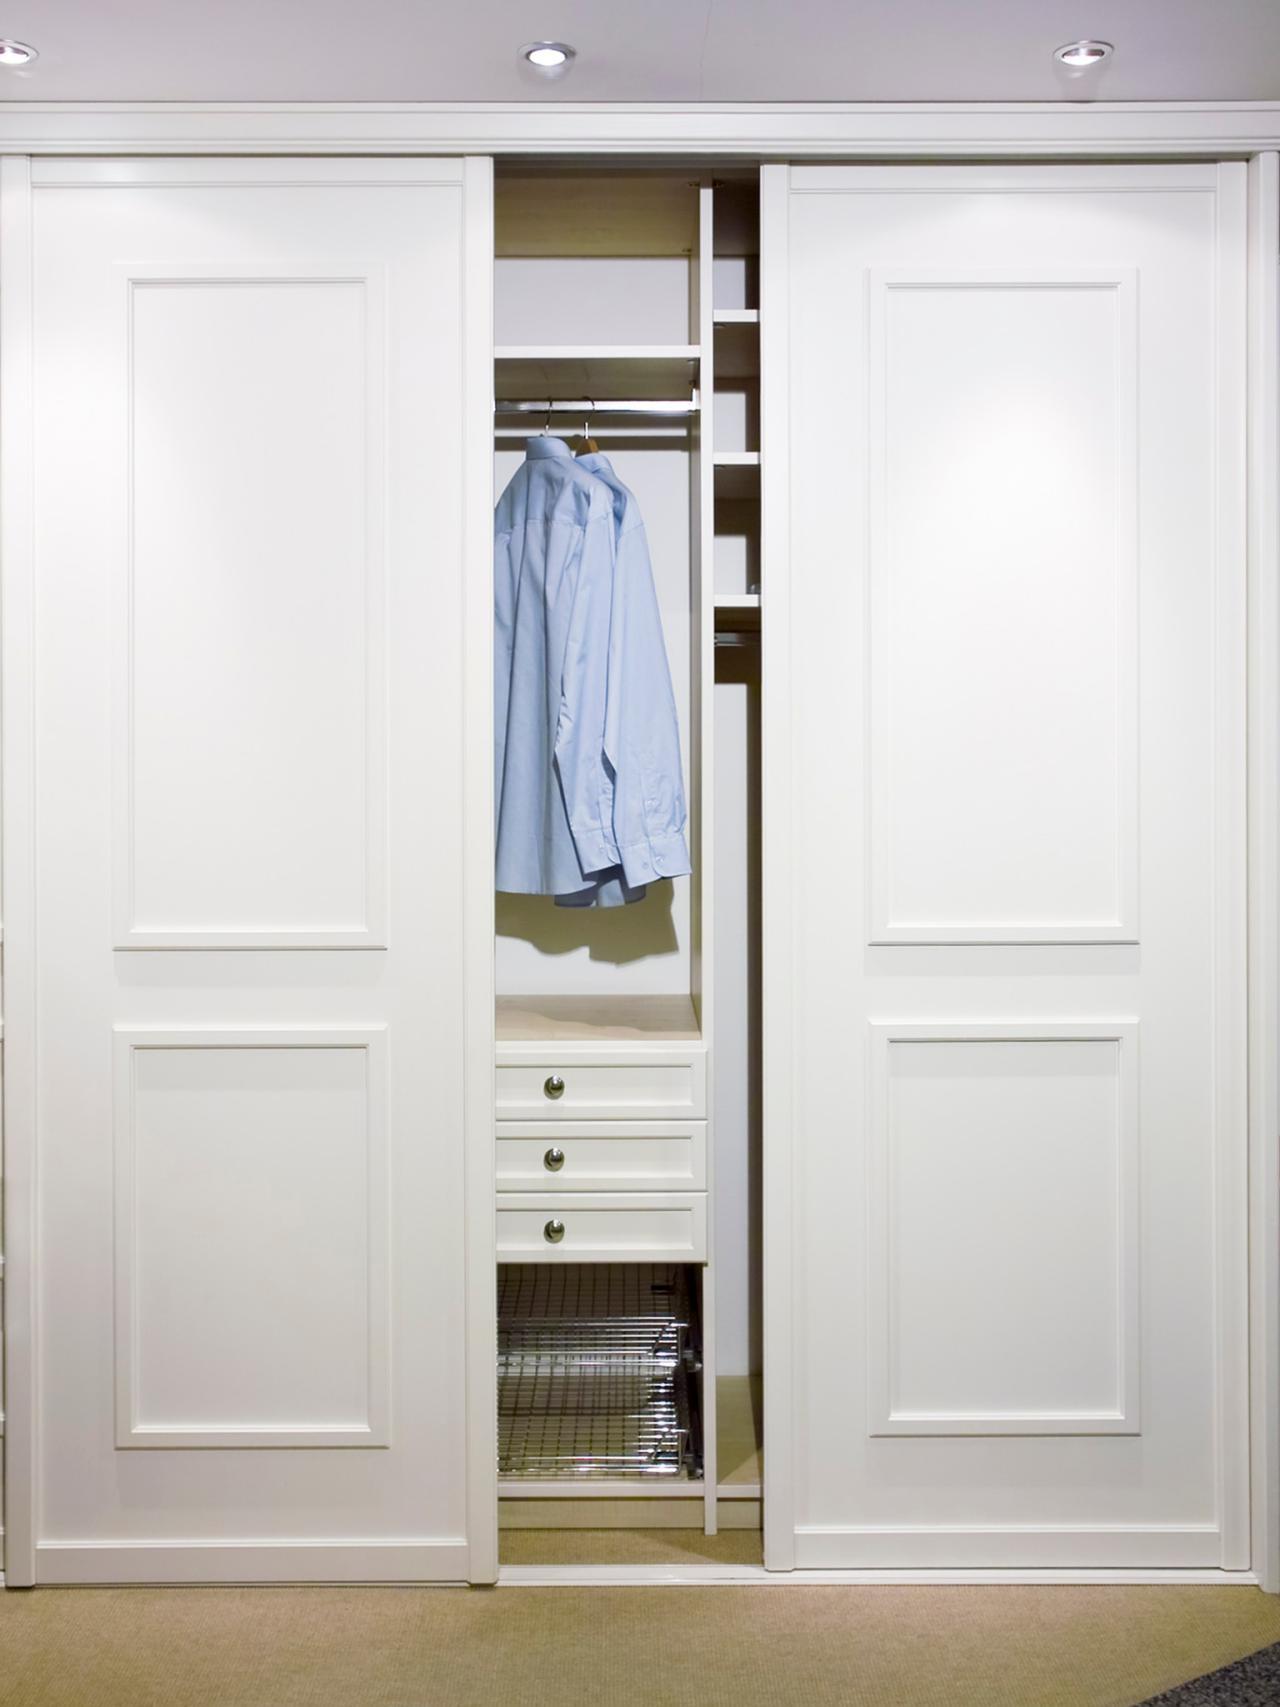 Awesome Sliding Closet Doors: Design Ideas and Options closet sliding doors